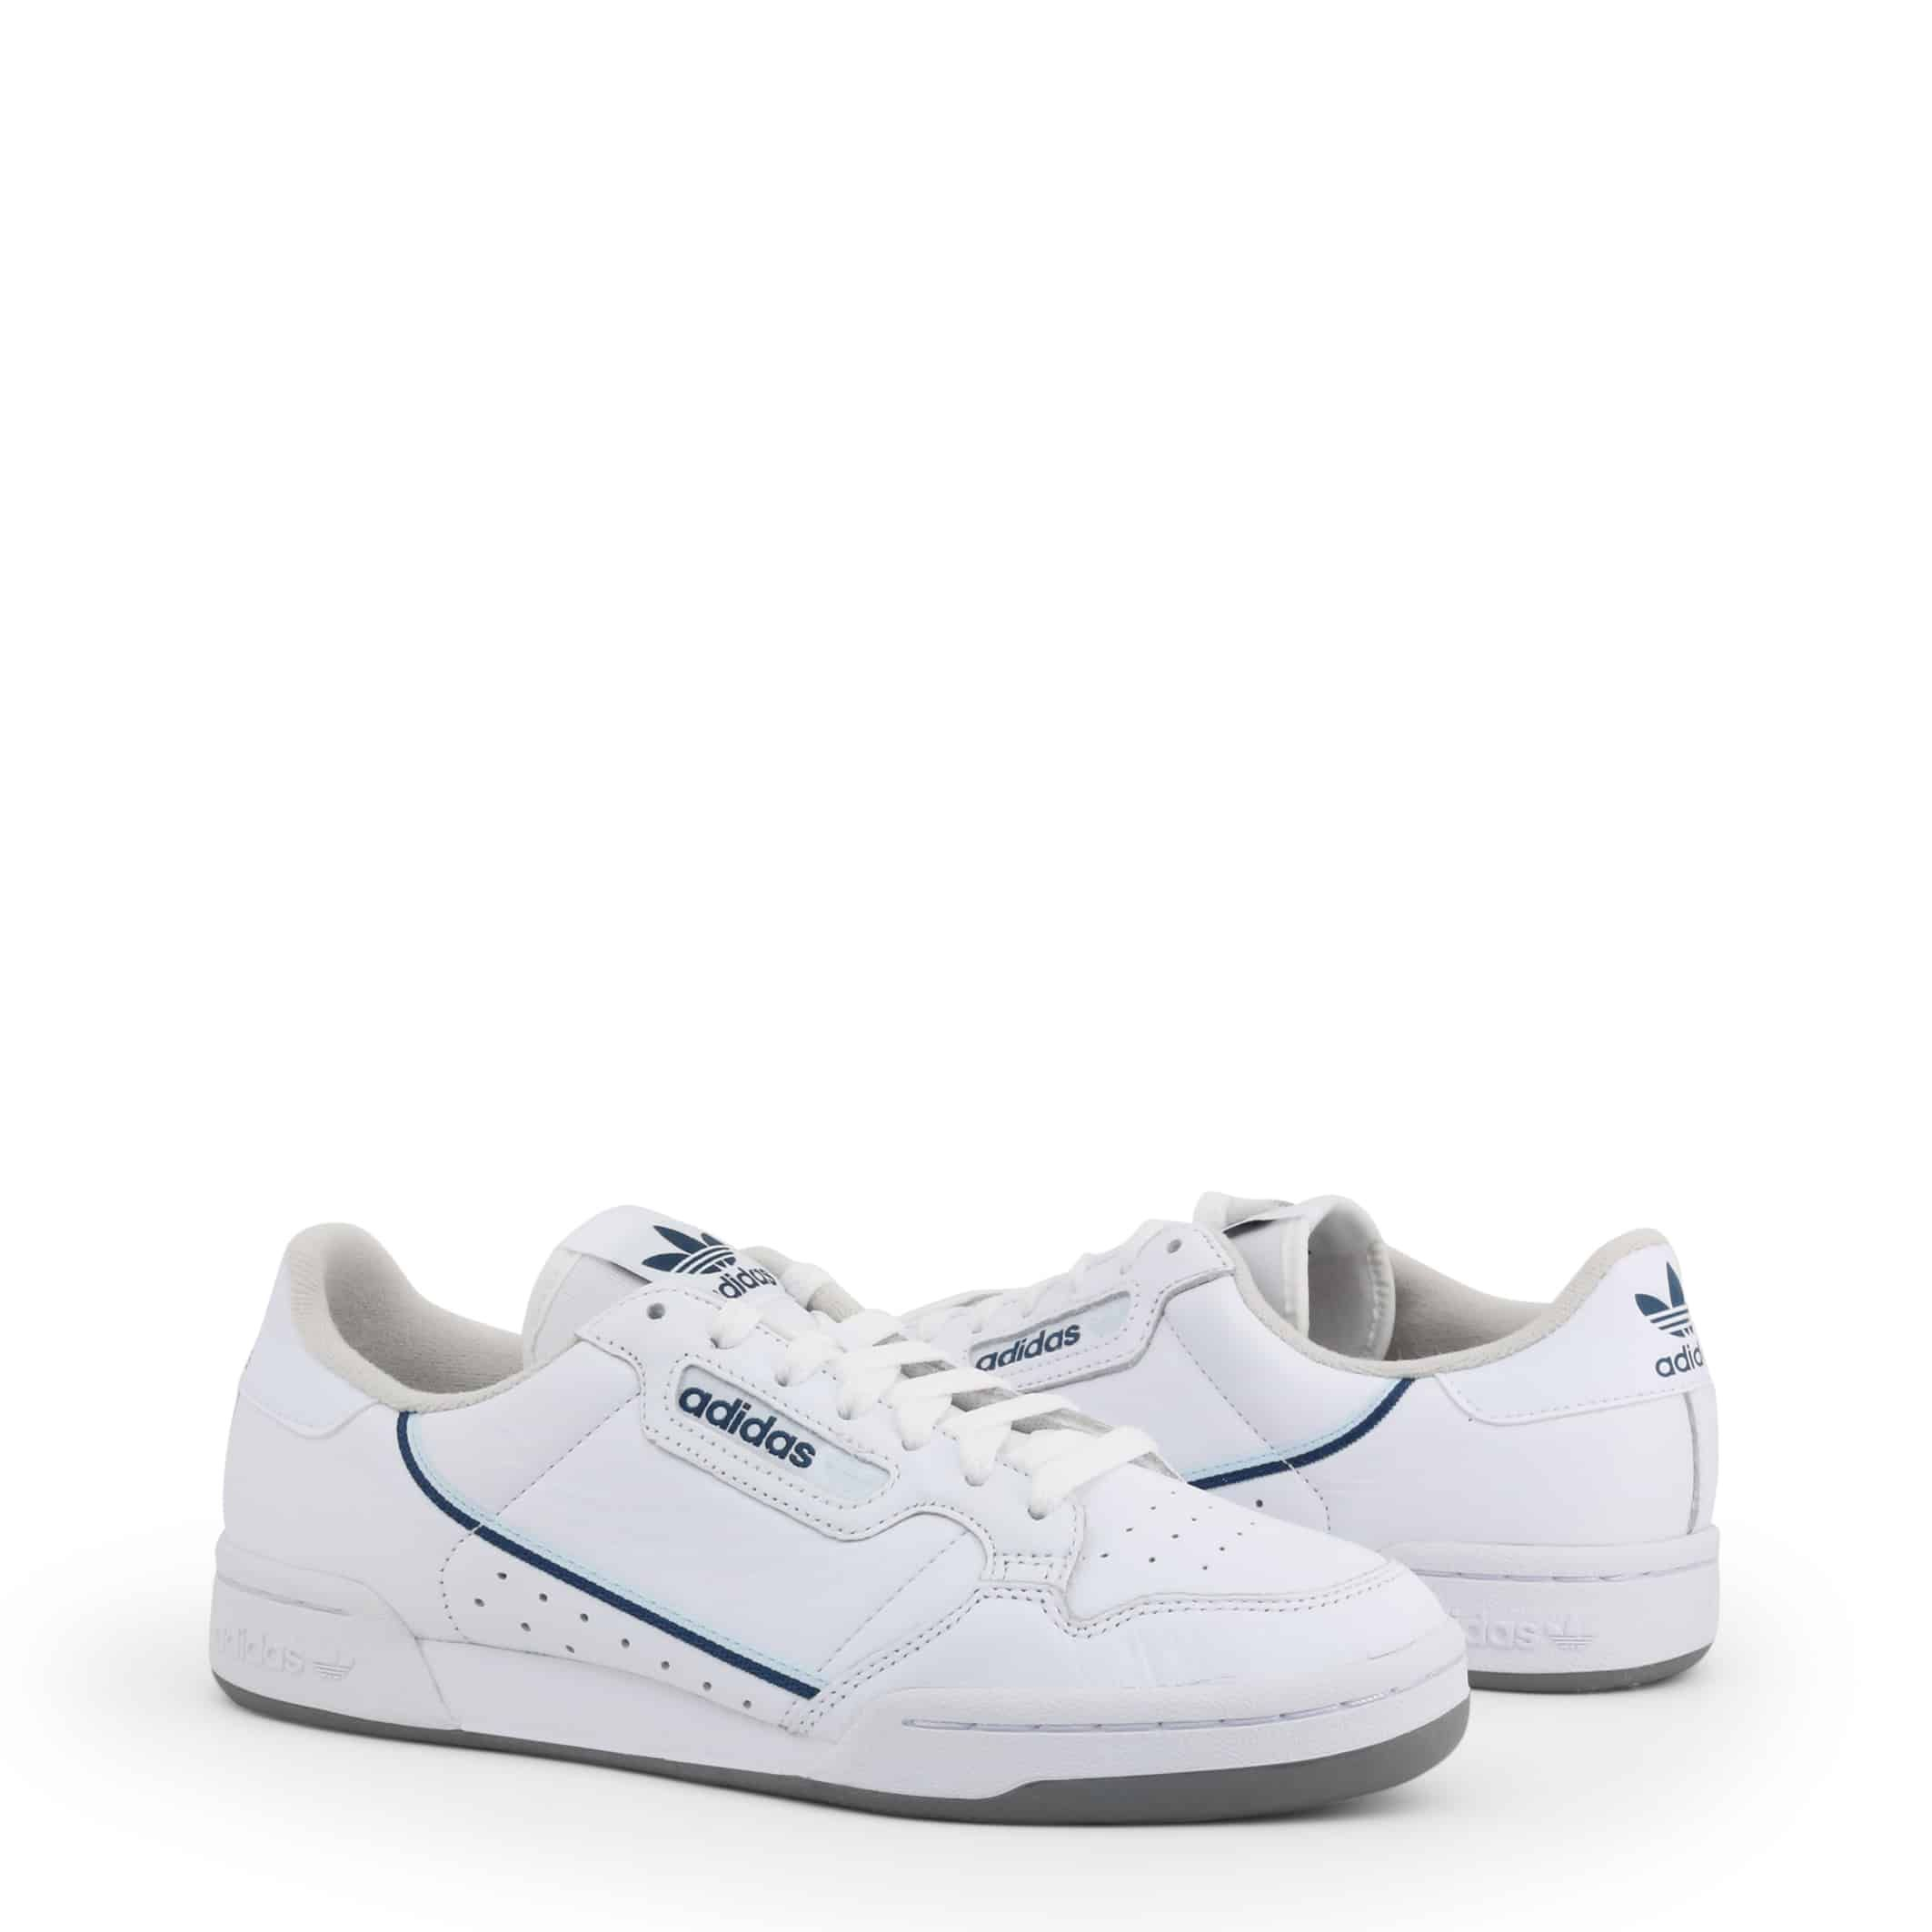 Adidas – Continental80 – Bianco